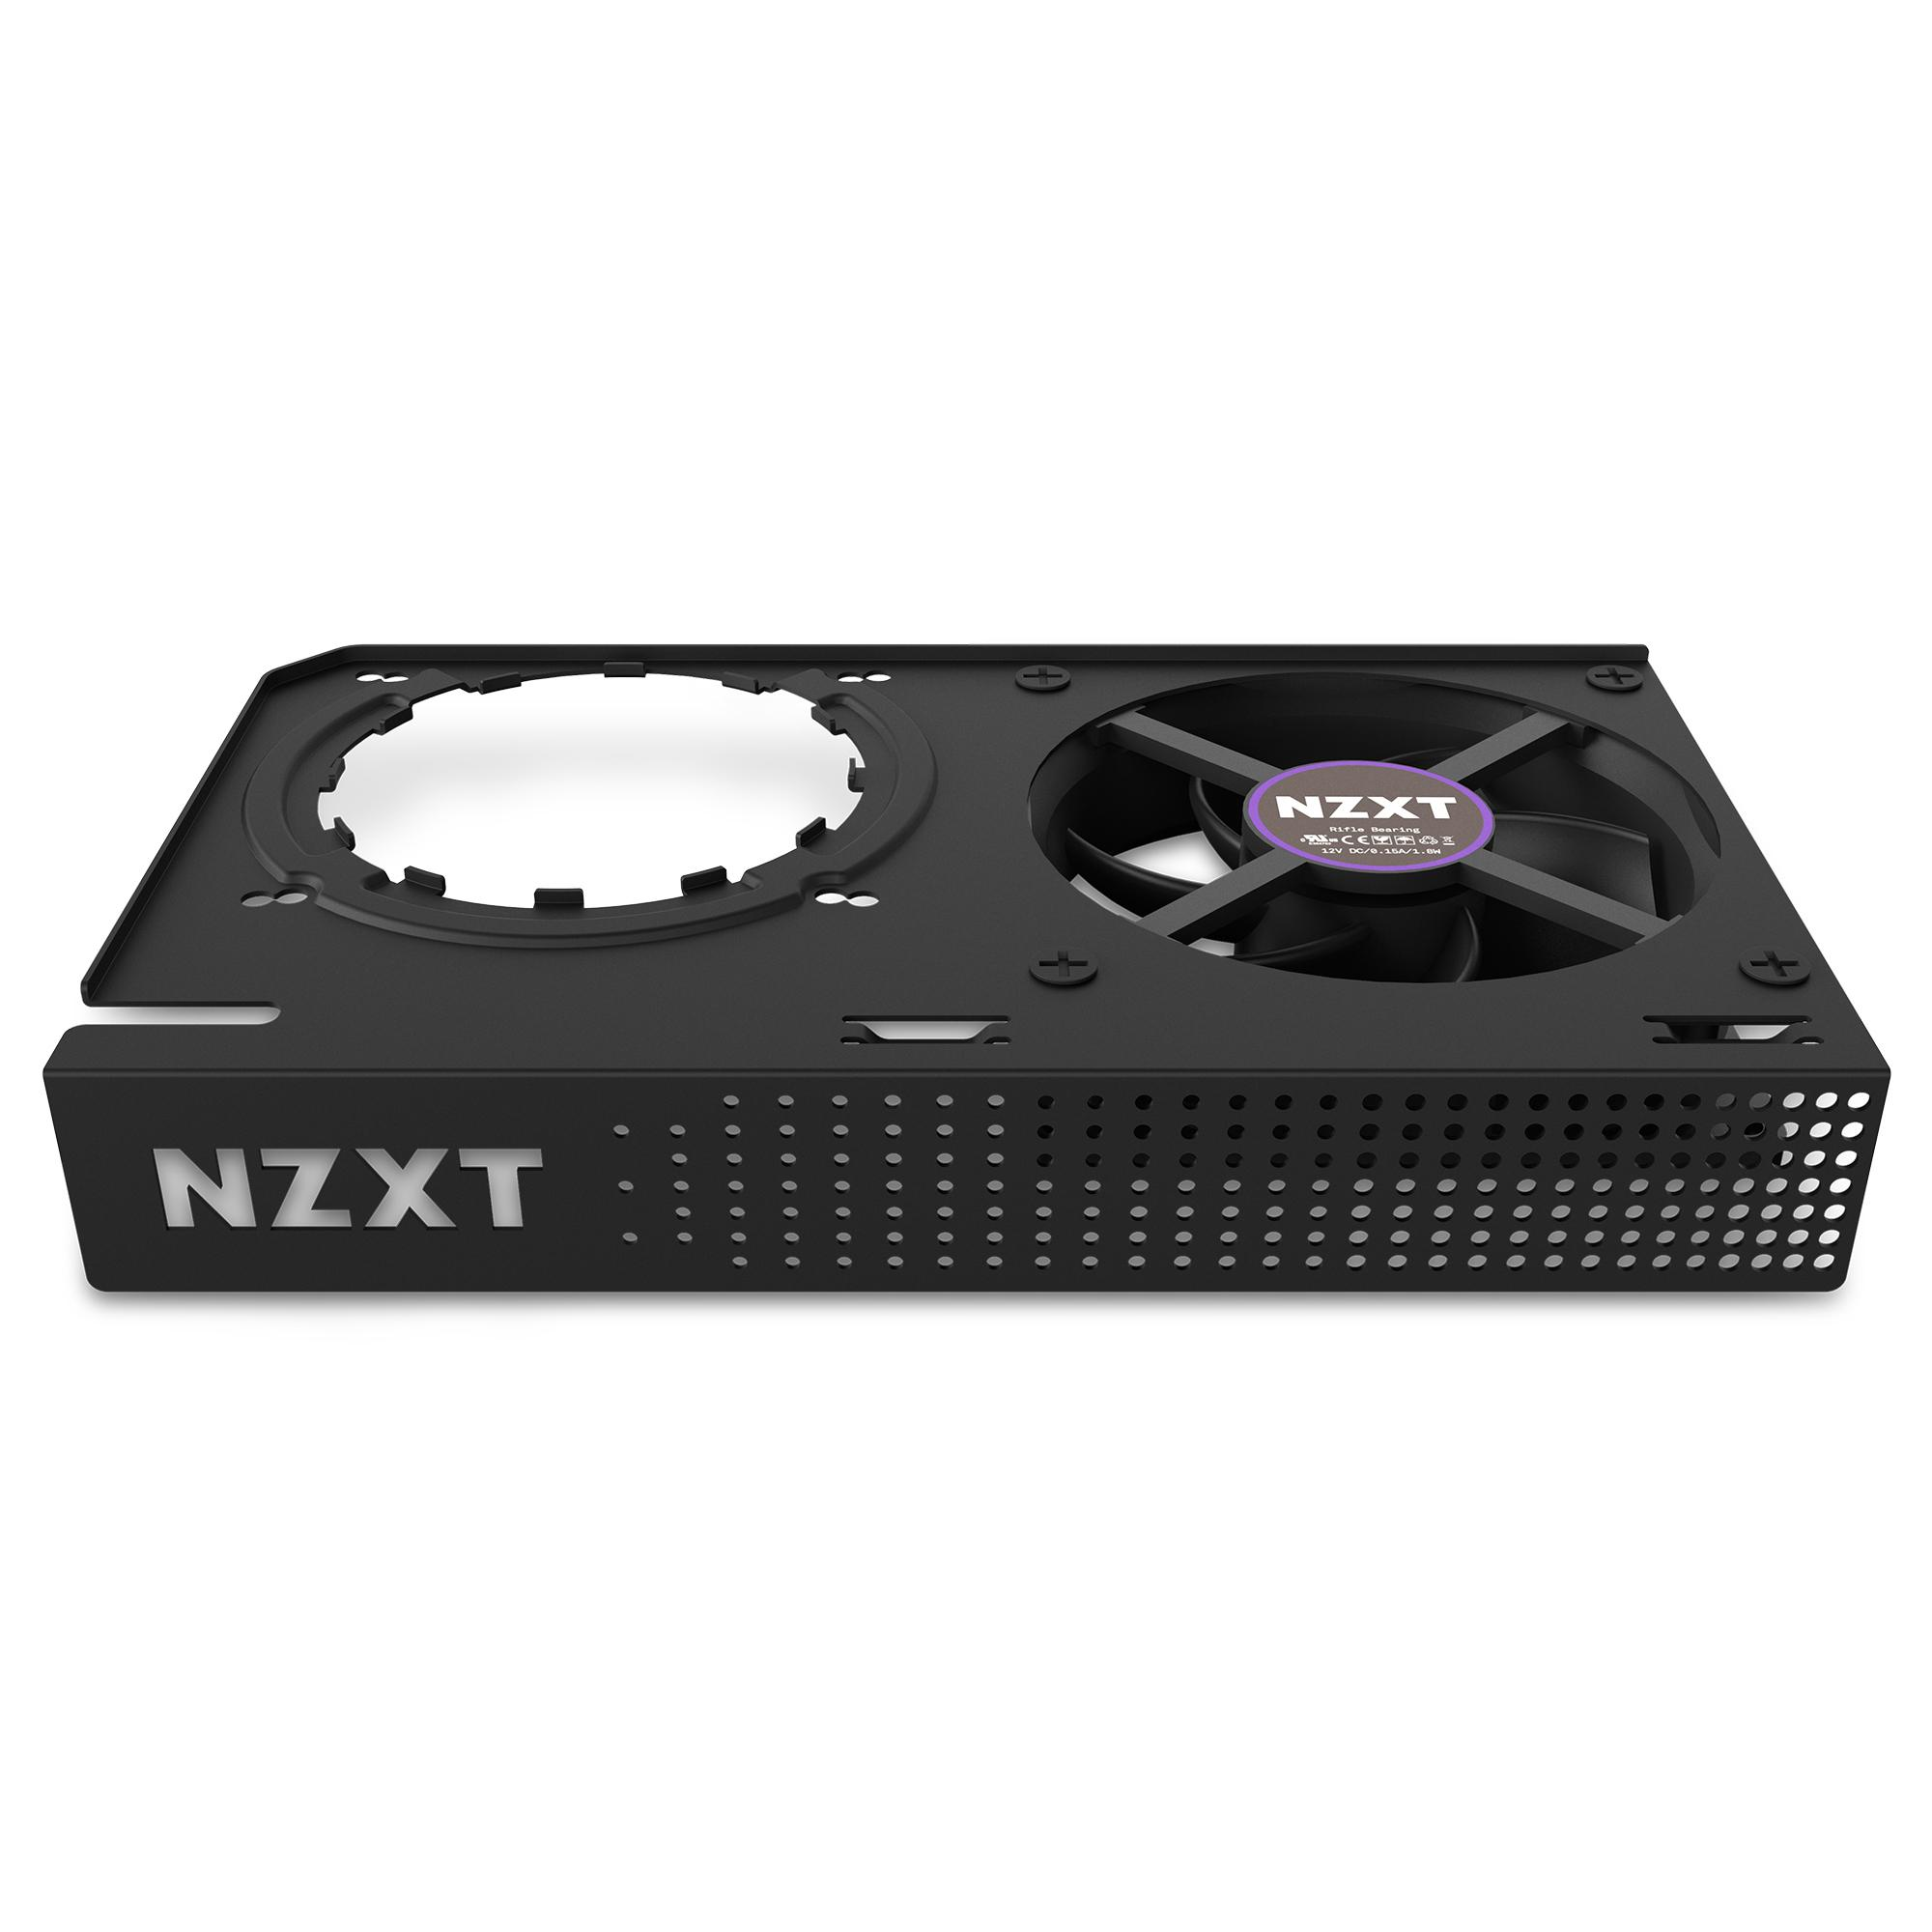 Amazon.com: NZXT Kraken G12 - Kit de montaje de GPU para ...